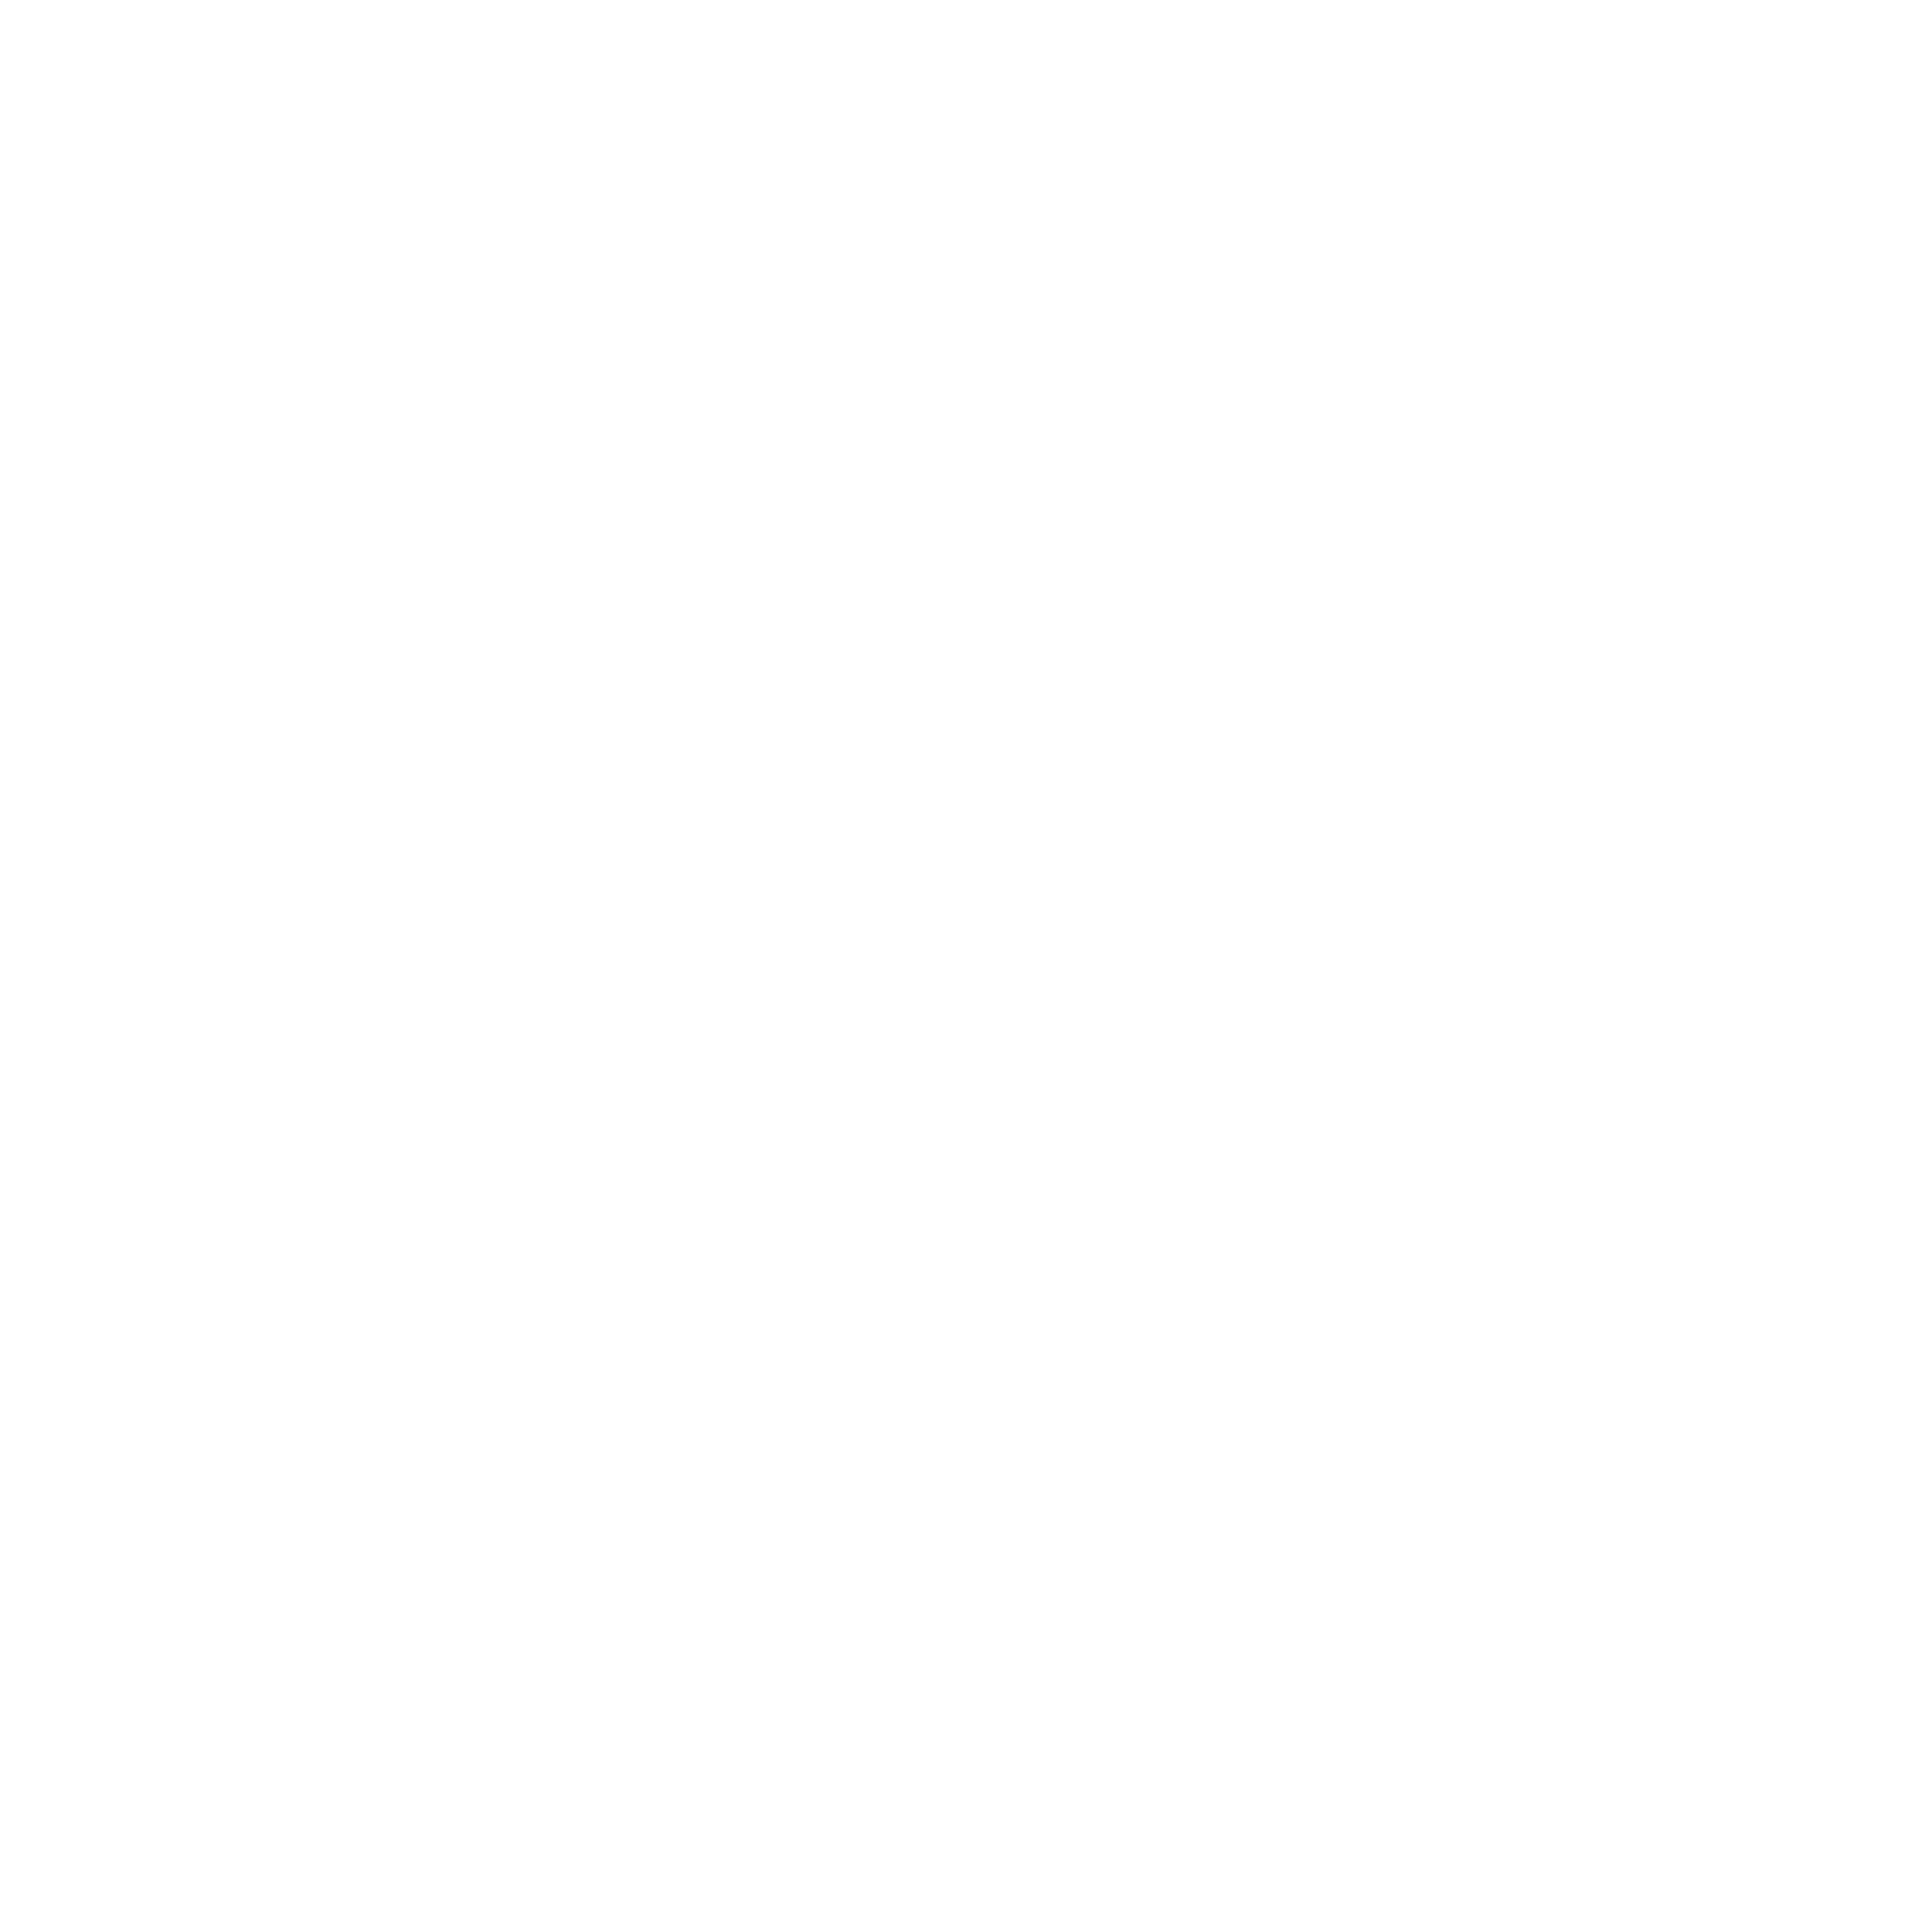 MG Food Company